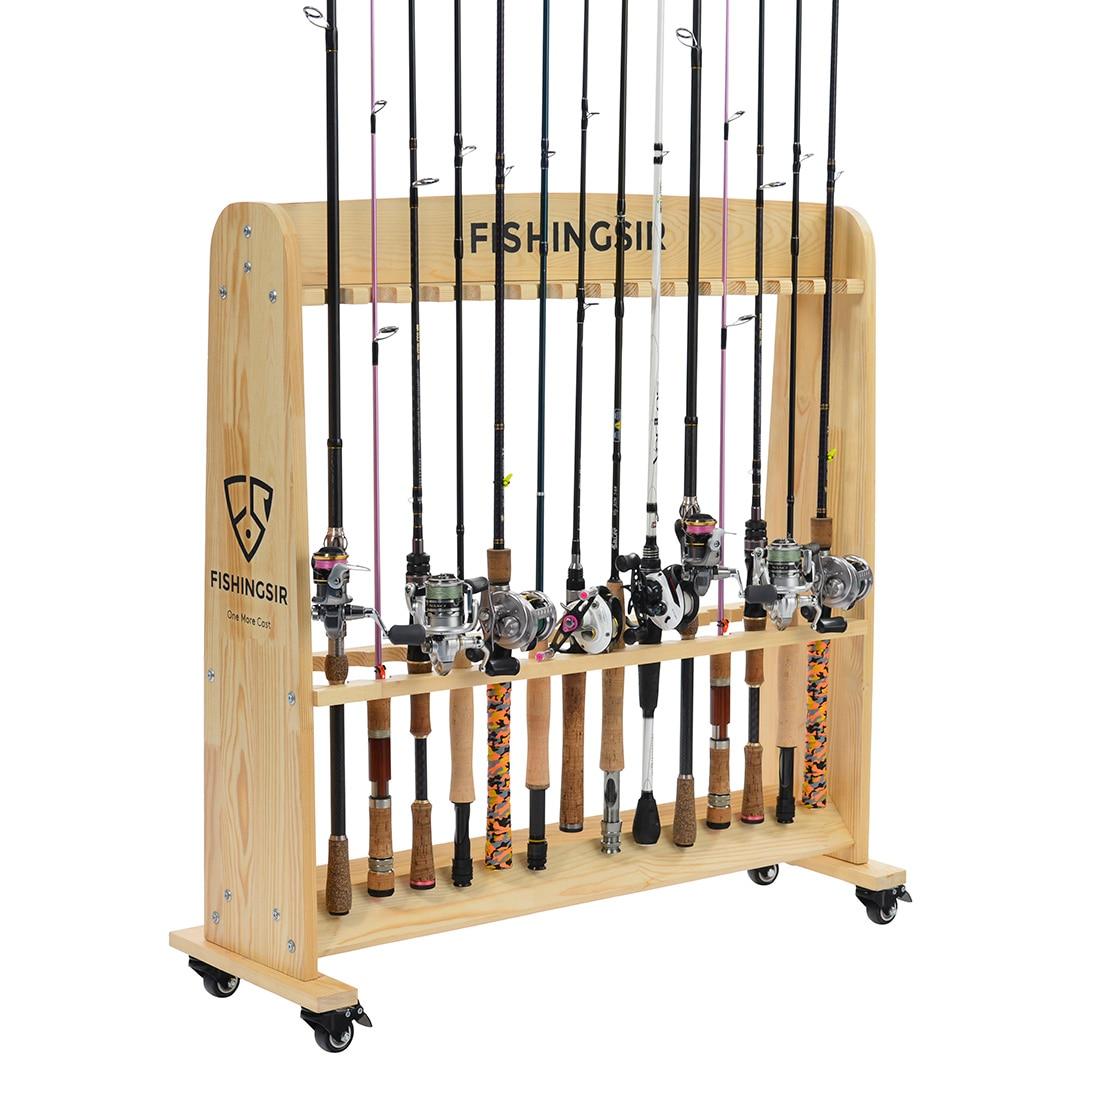 Aliexpress.com : Buy FISHINGSIR Fishing Rod Rack 28 Wood Rod Holder ...